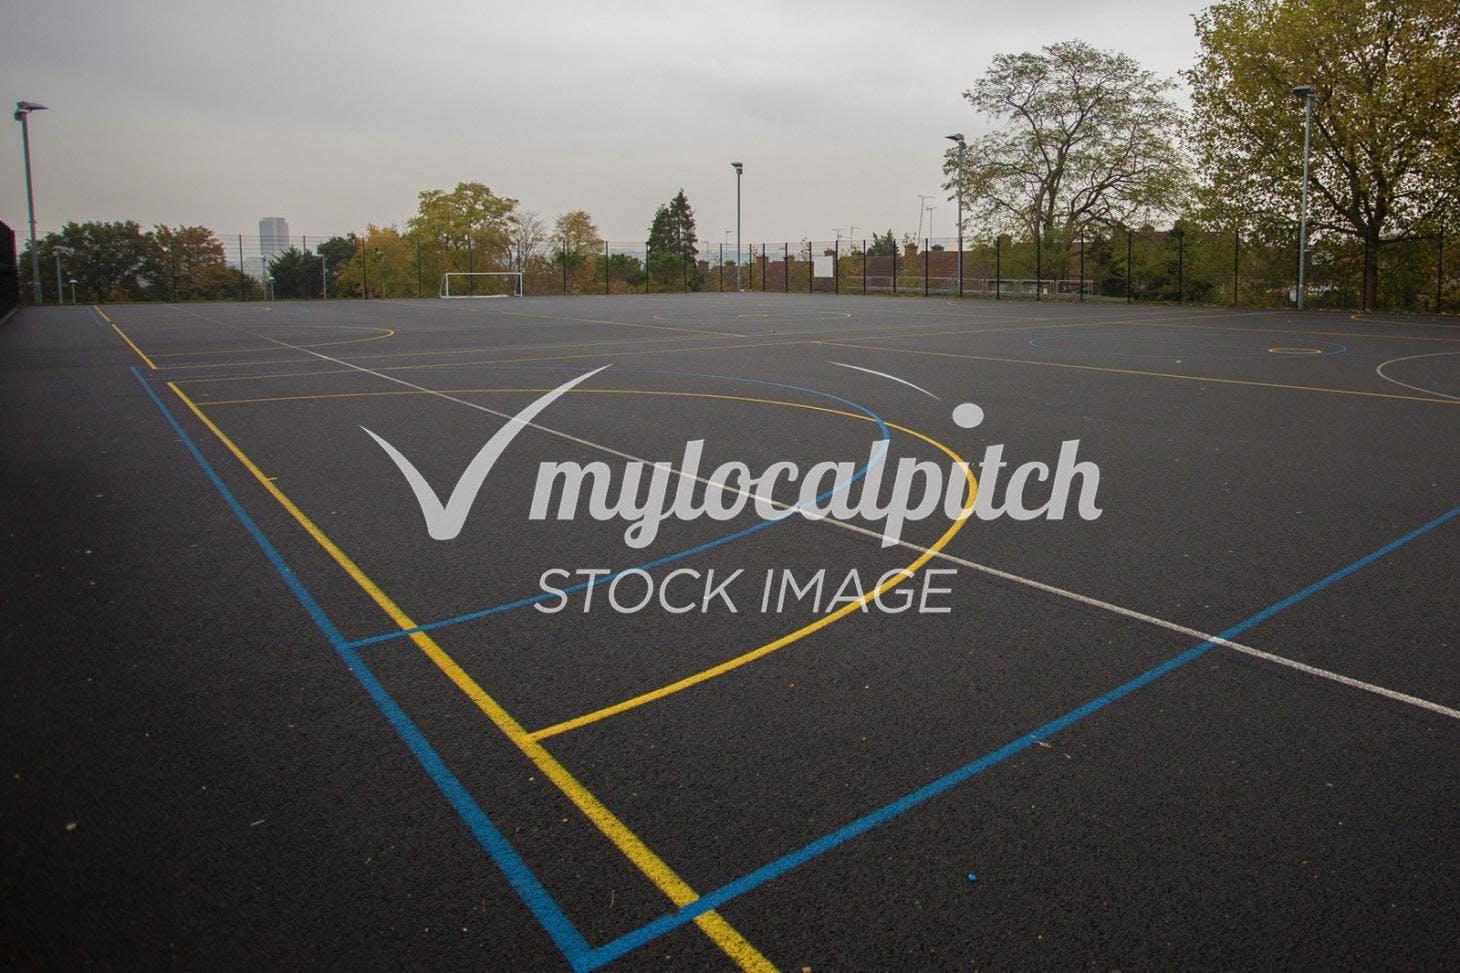 Stanborough School Outdoor | Concrete tennis court